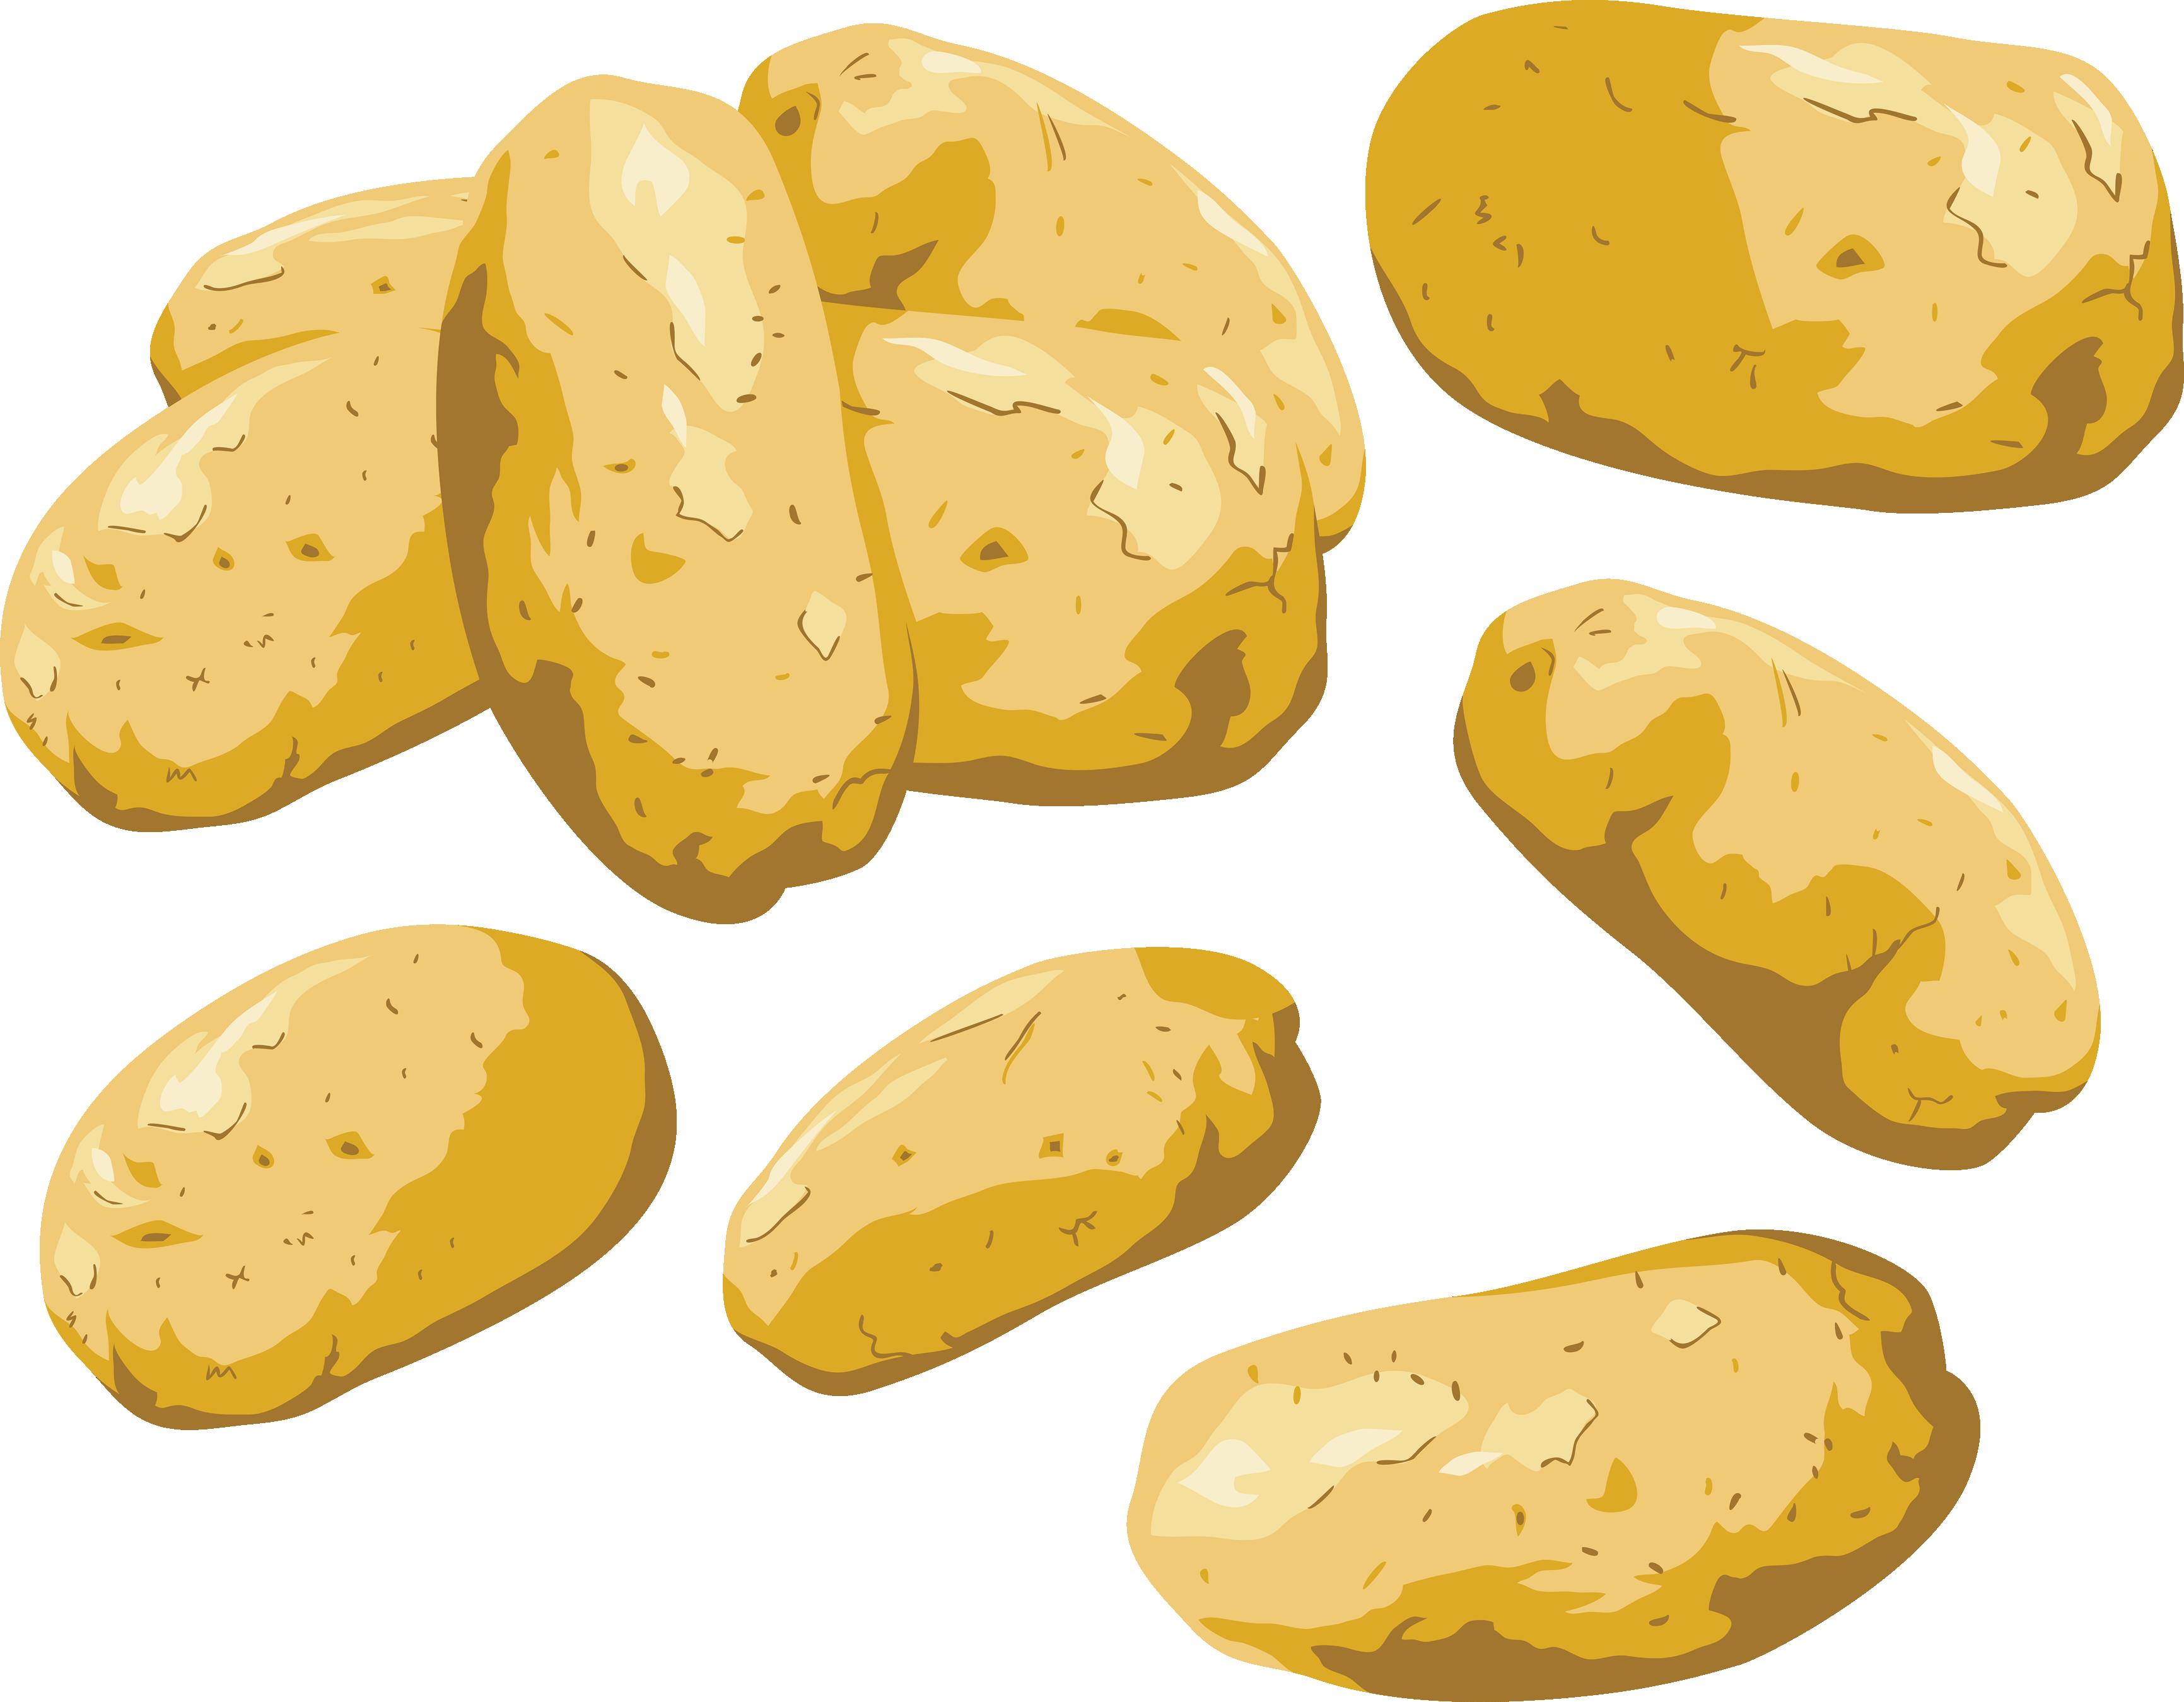 vector transparent stock Potato clip art free. Potatoes clipart.